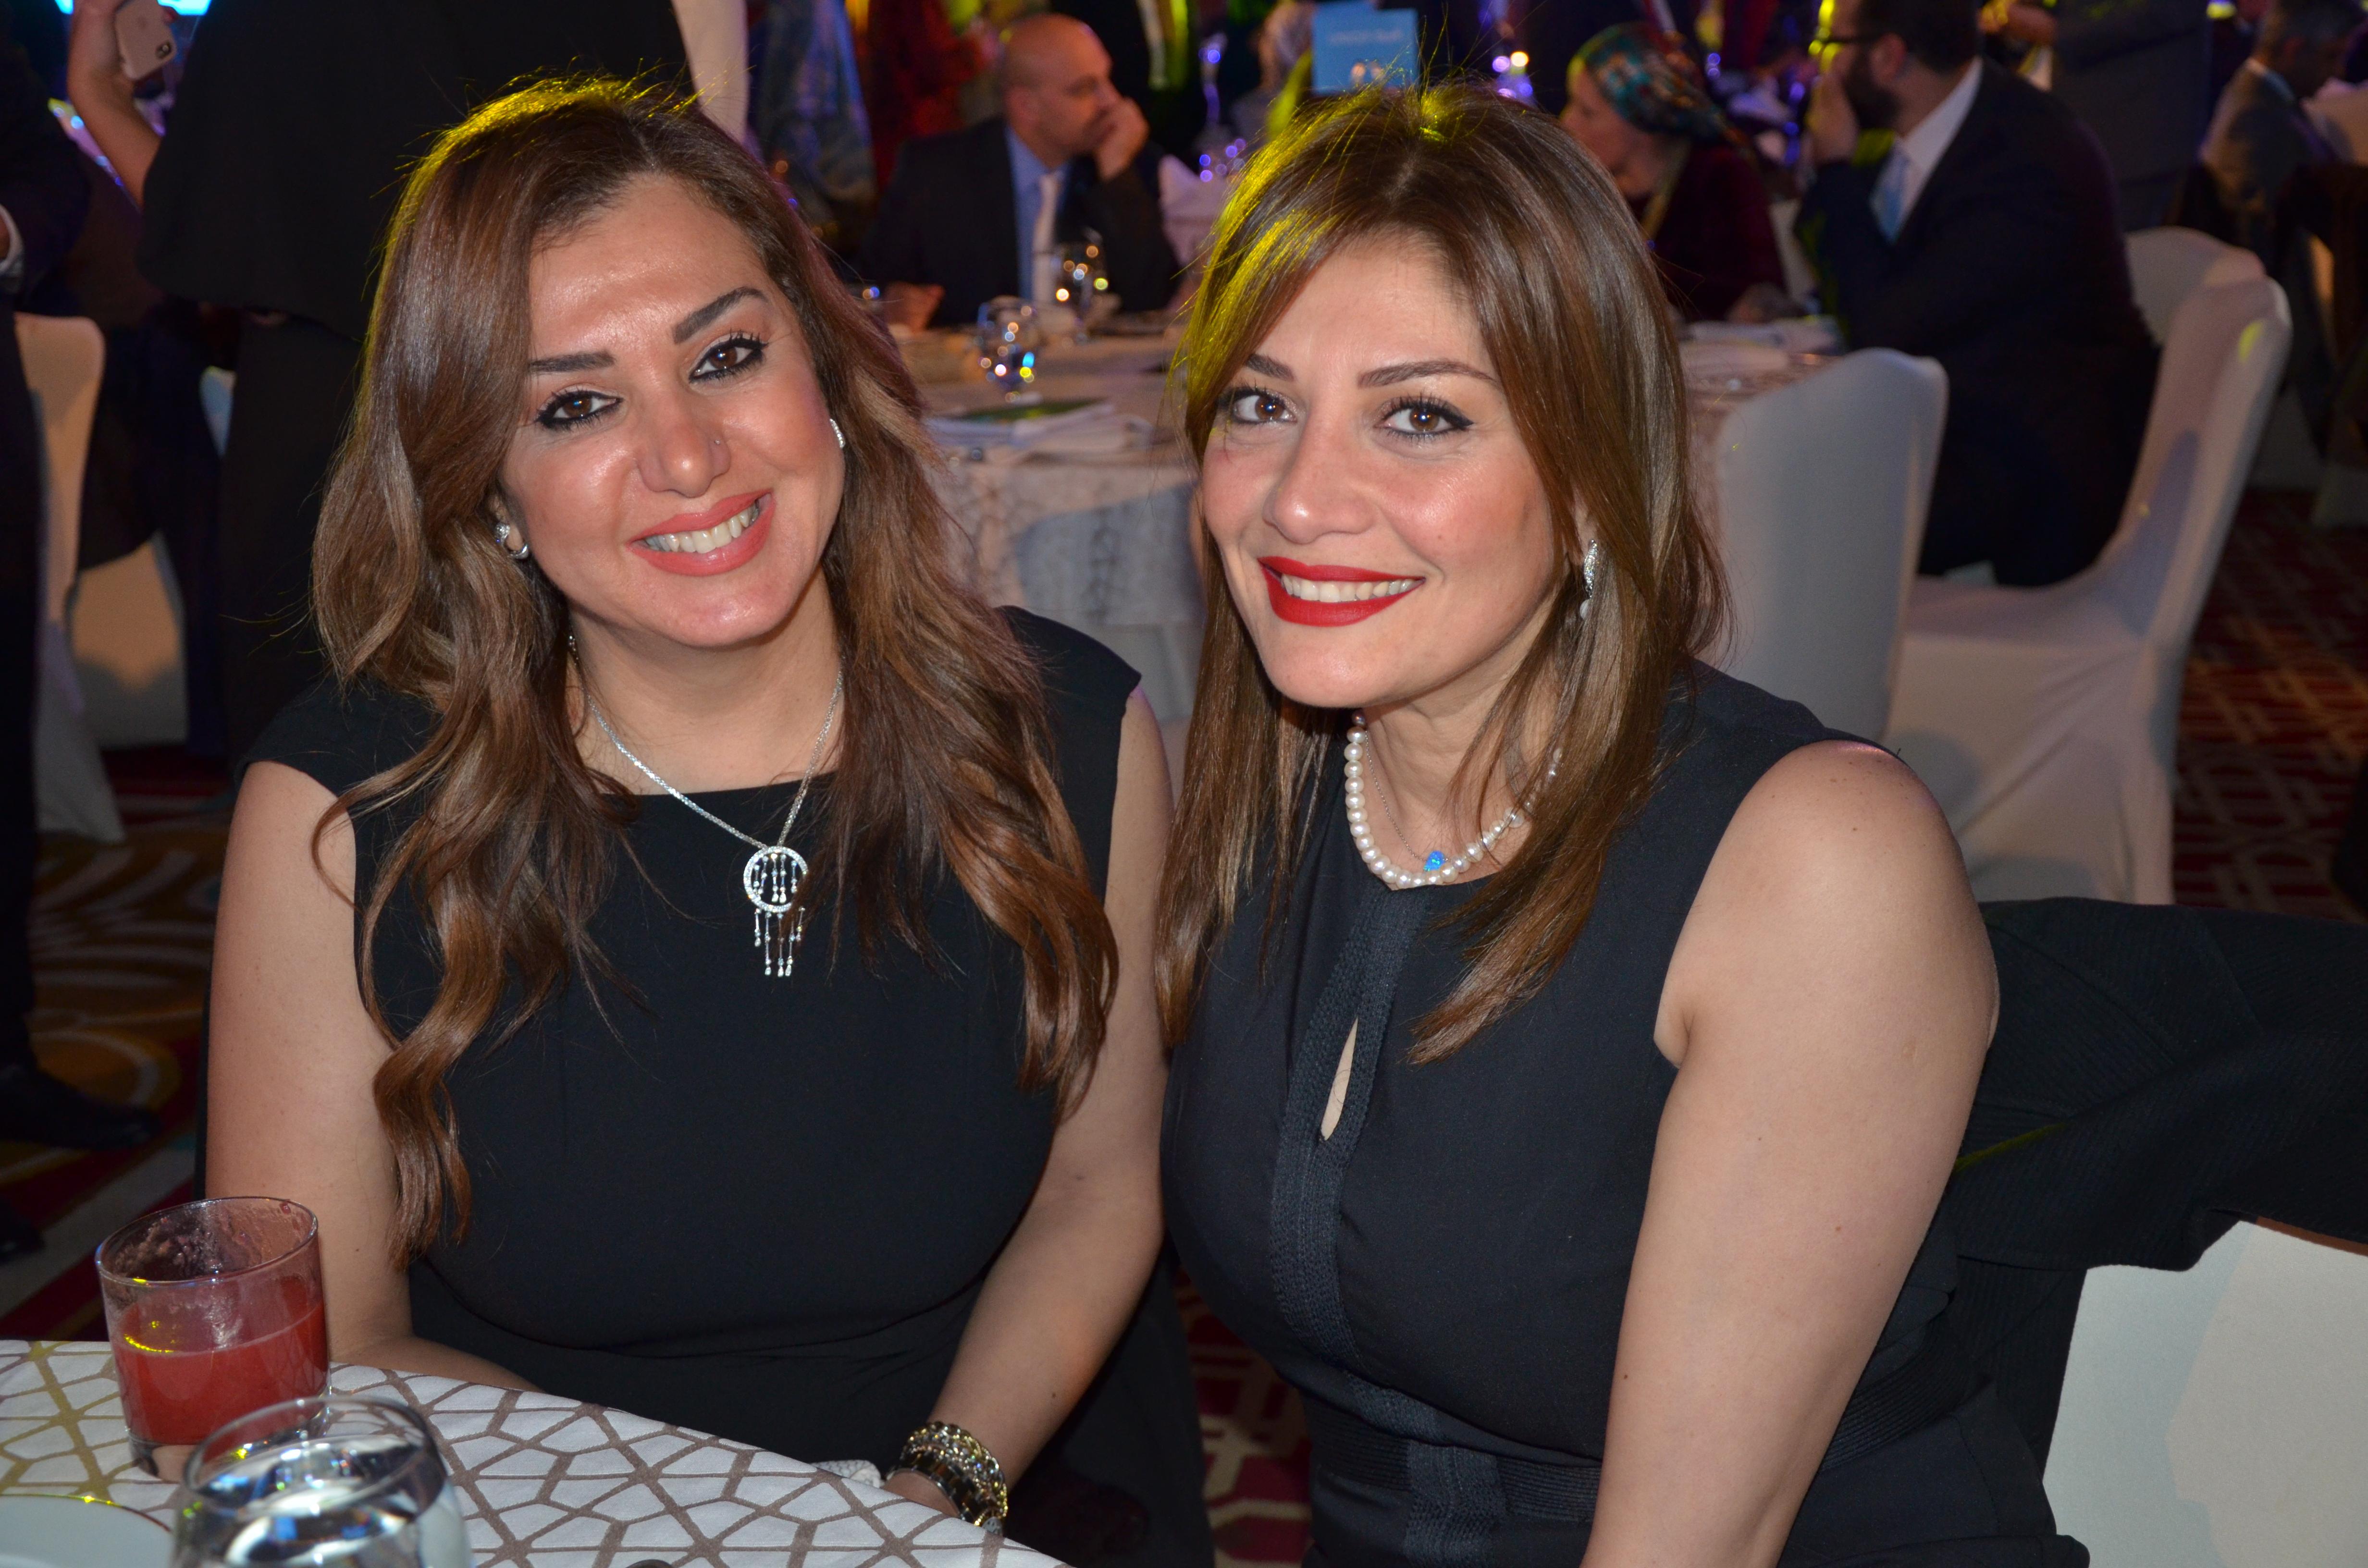 Ms. Lamia Lasheen & Ms. Sahar Azmy